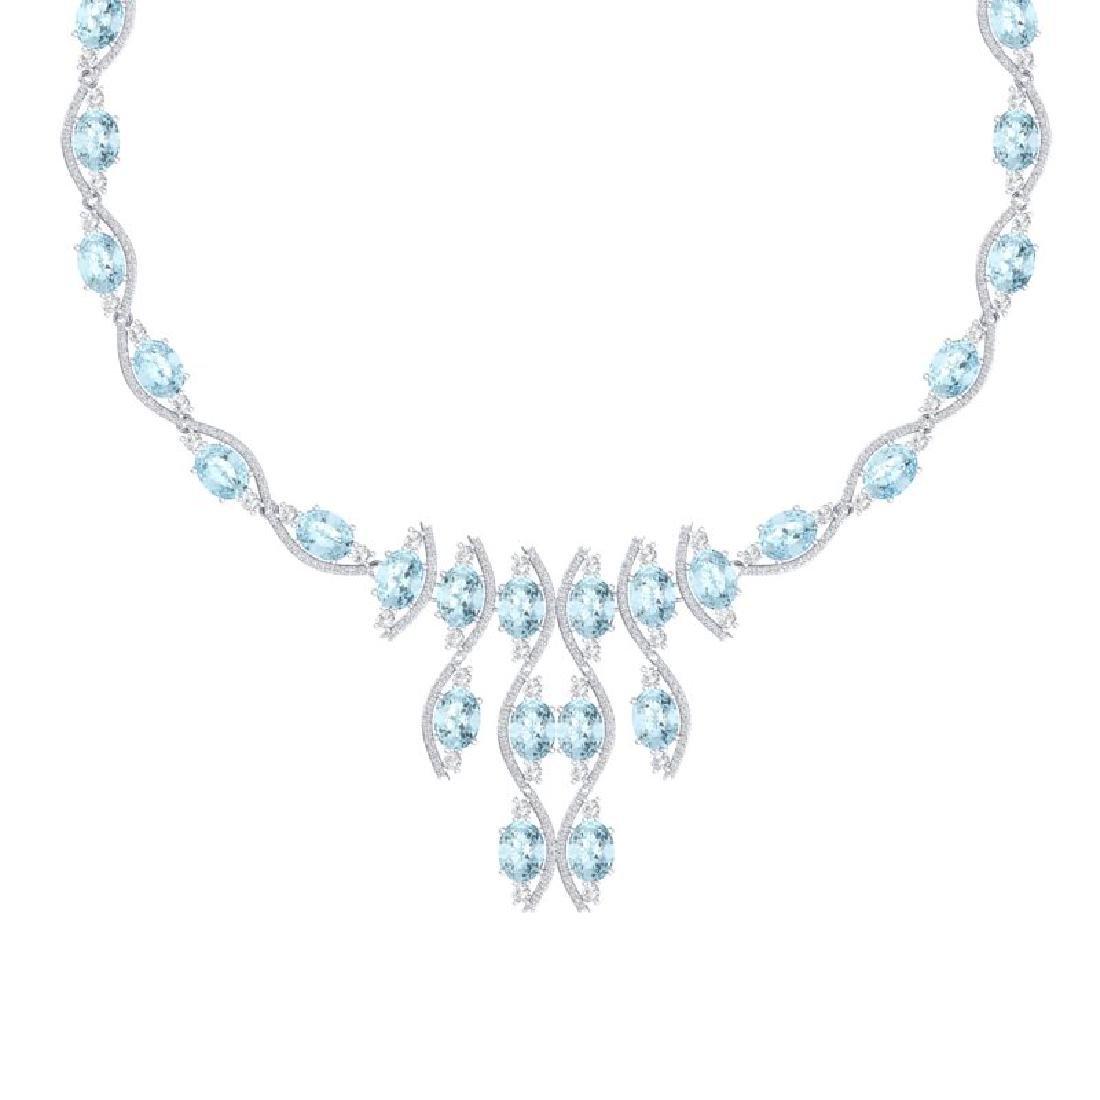 68.12 CTW Royalty Sky Topaz & VS Diamond Necklace 18K - 2